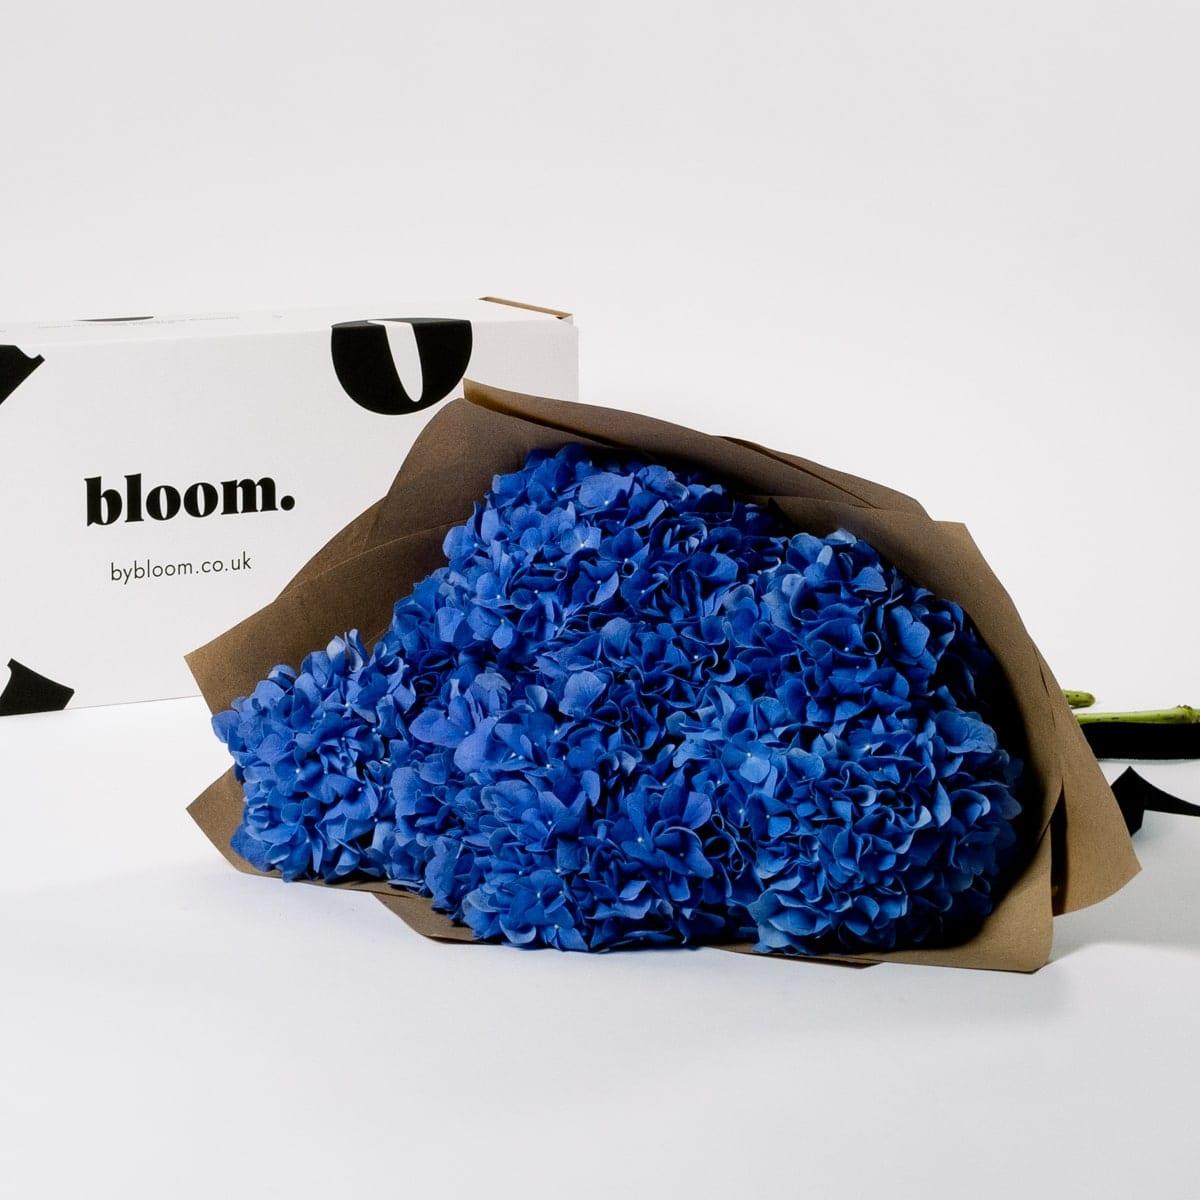 Bloom Flower Delivery   Ultra Marine Blue Hydrangea